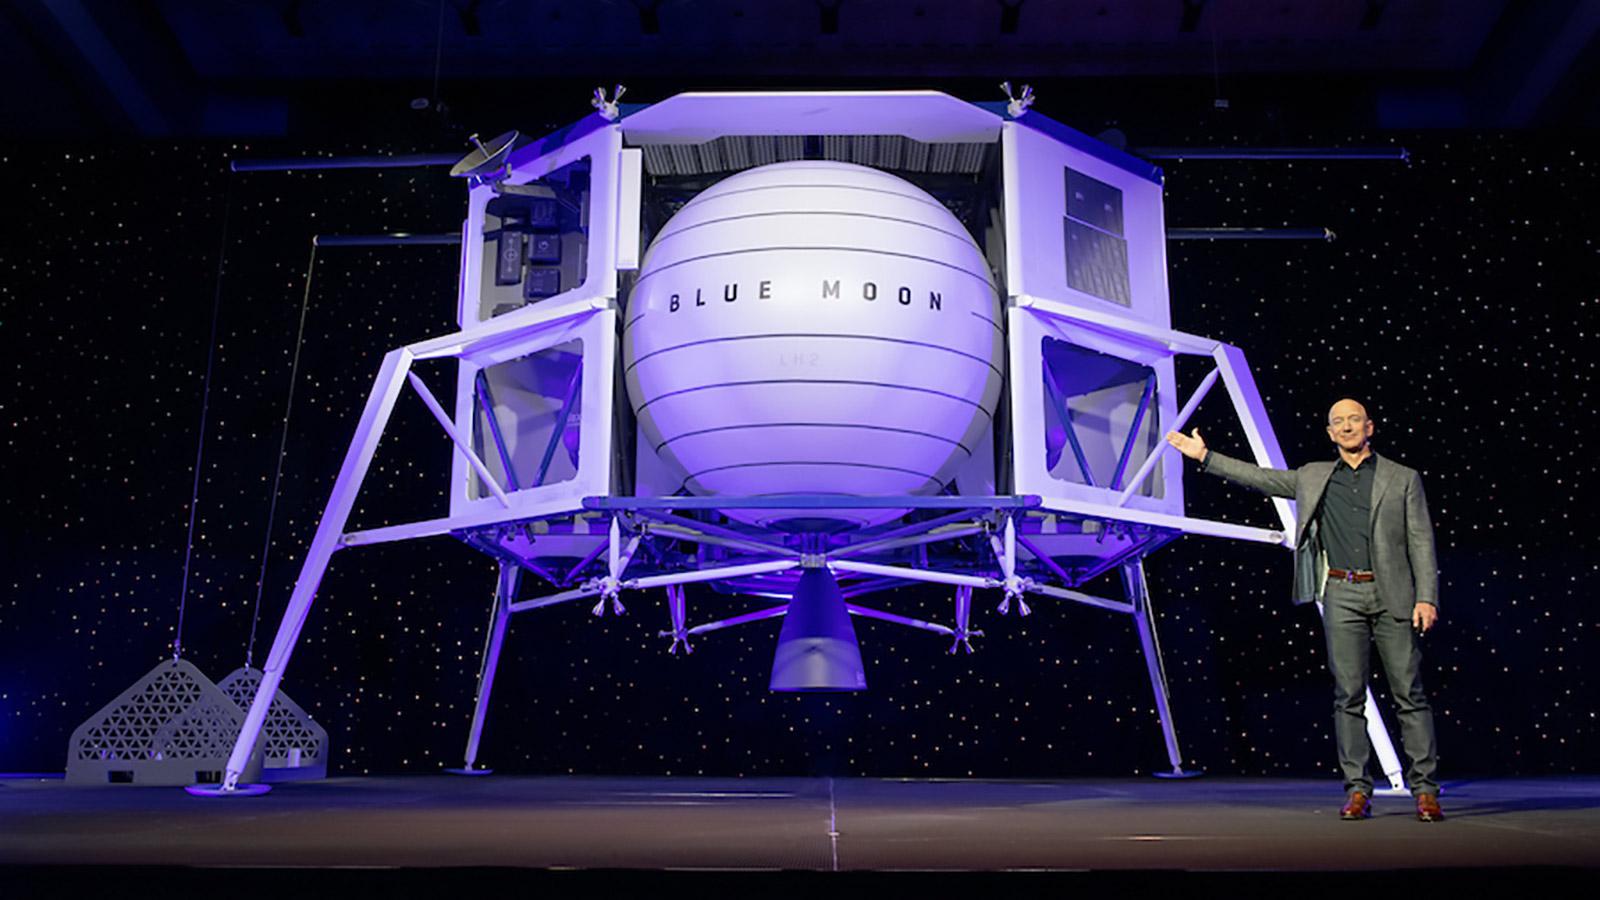 Jeff Bezos Standing Next To Blue Moon, Blue Origin's Proposed Lunar Lander